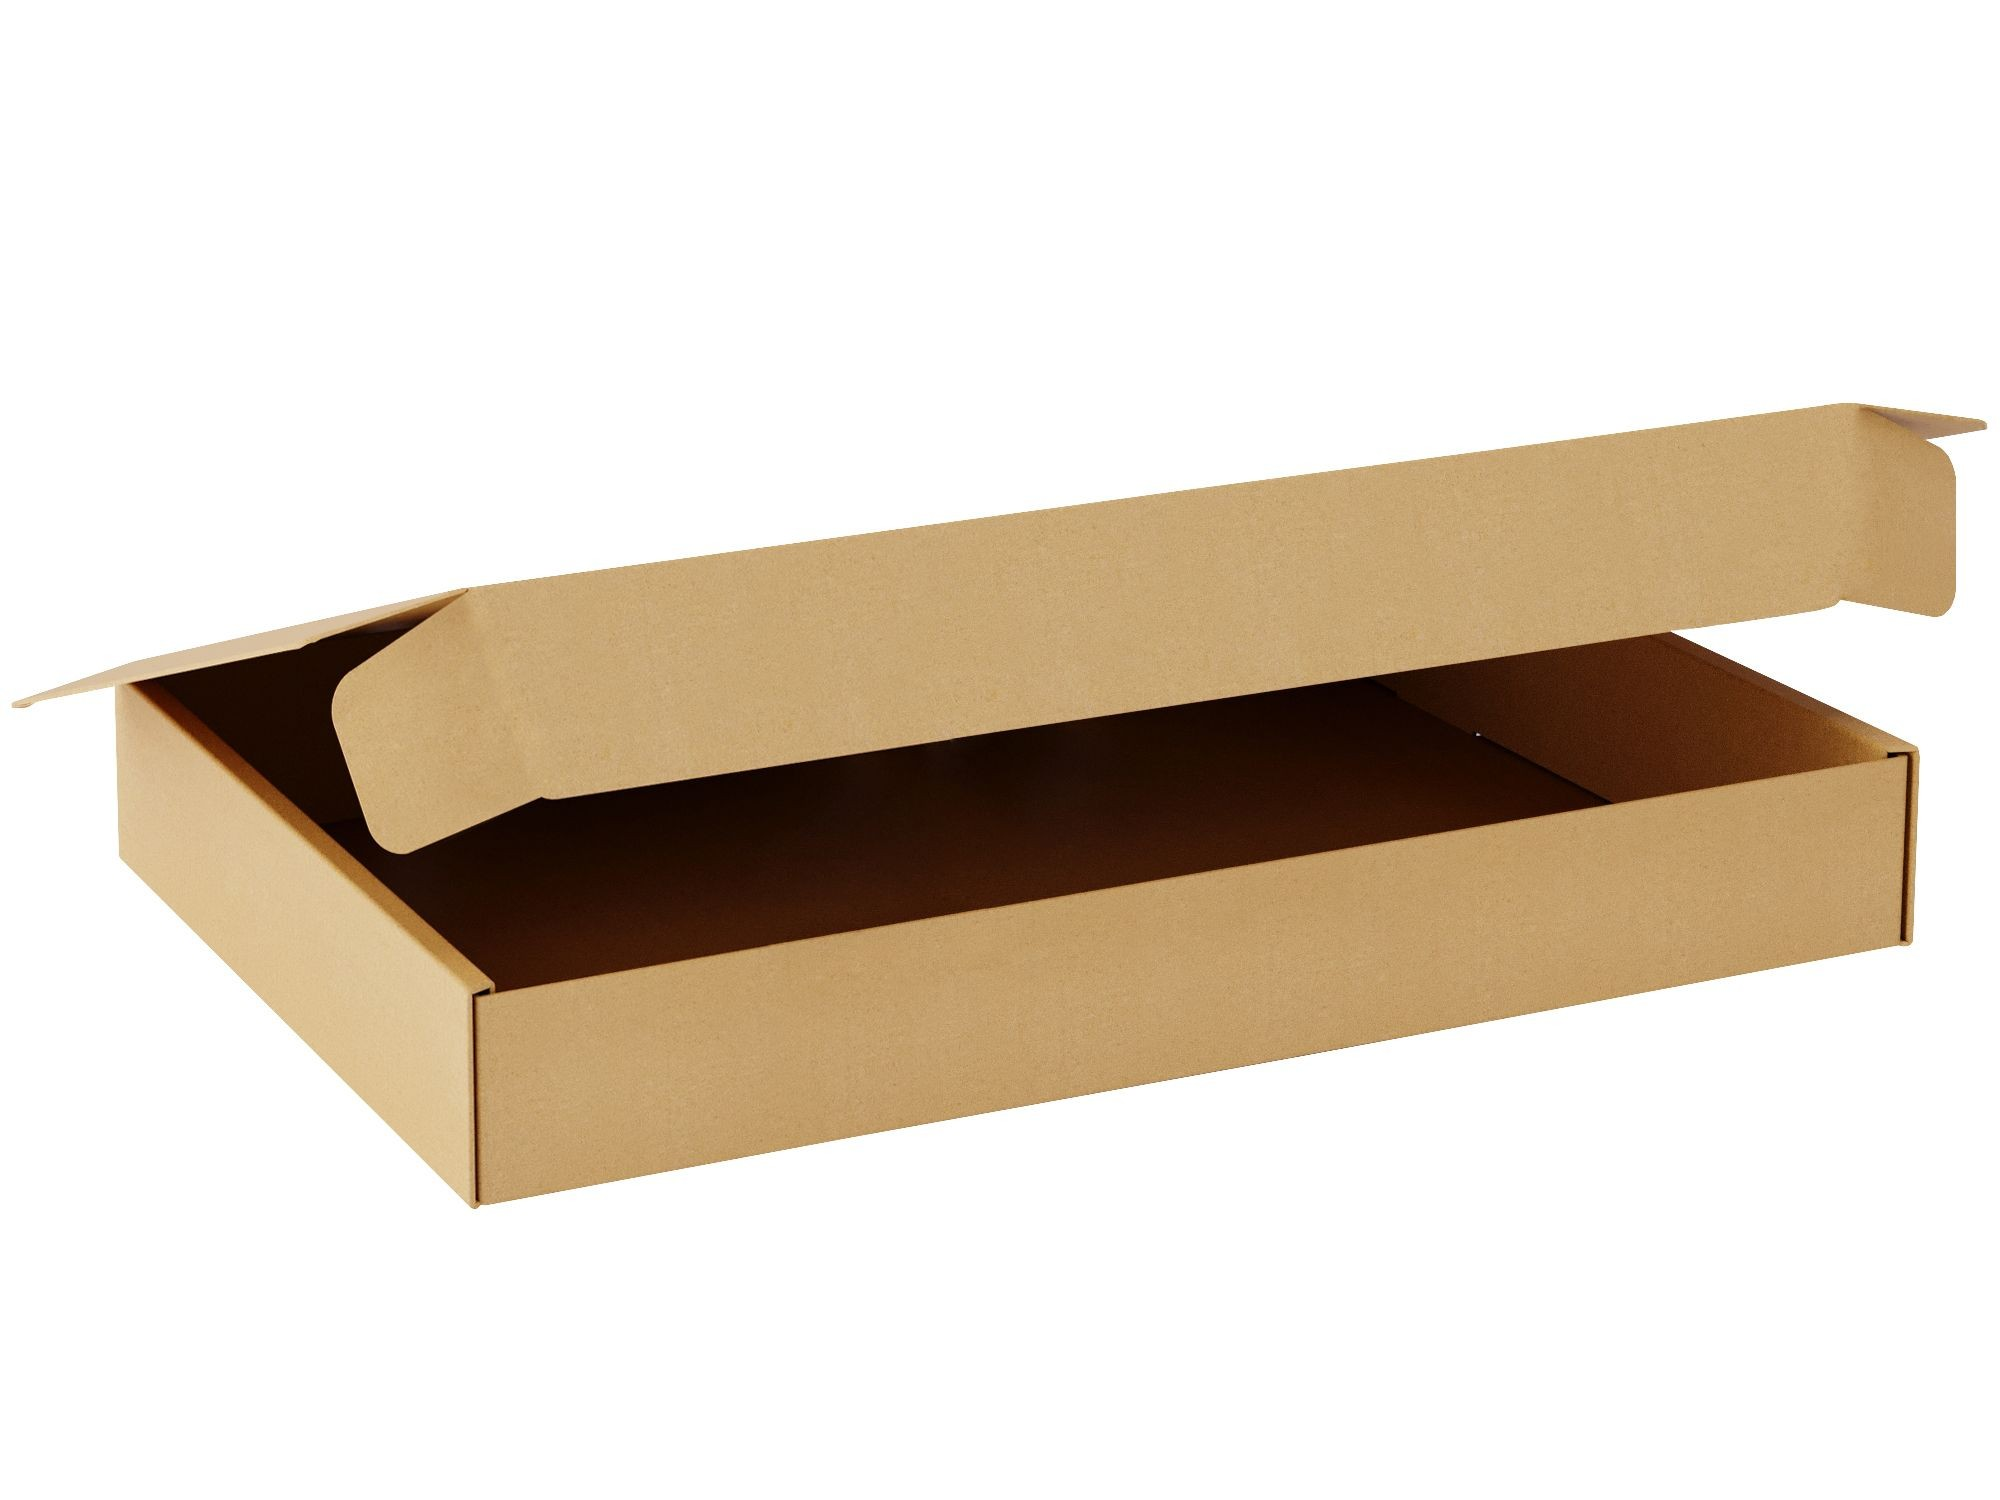 "TOTALPACK® 8 x 5 1/2 x 1 1/2"" Single Wall Corrugated Boxes ""Interlock Die-Cut"" 25 Units"